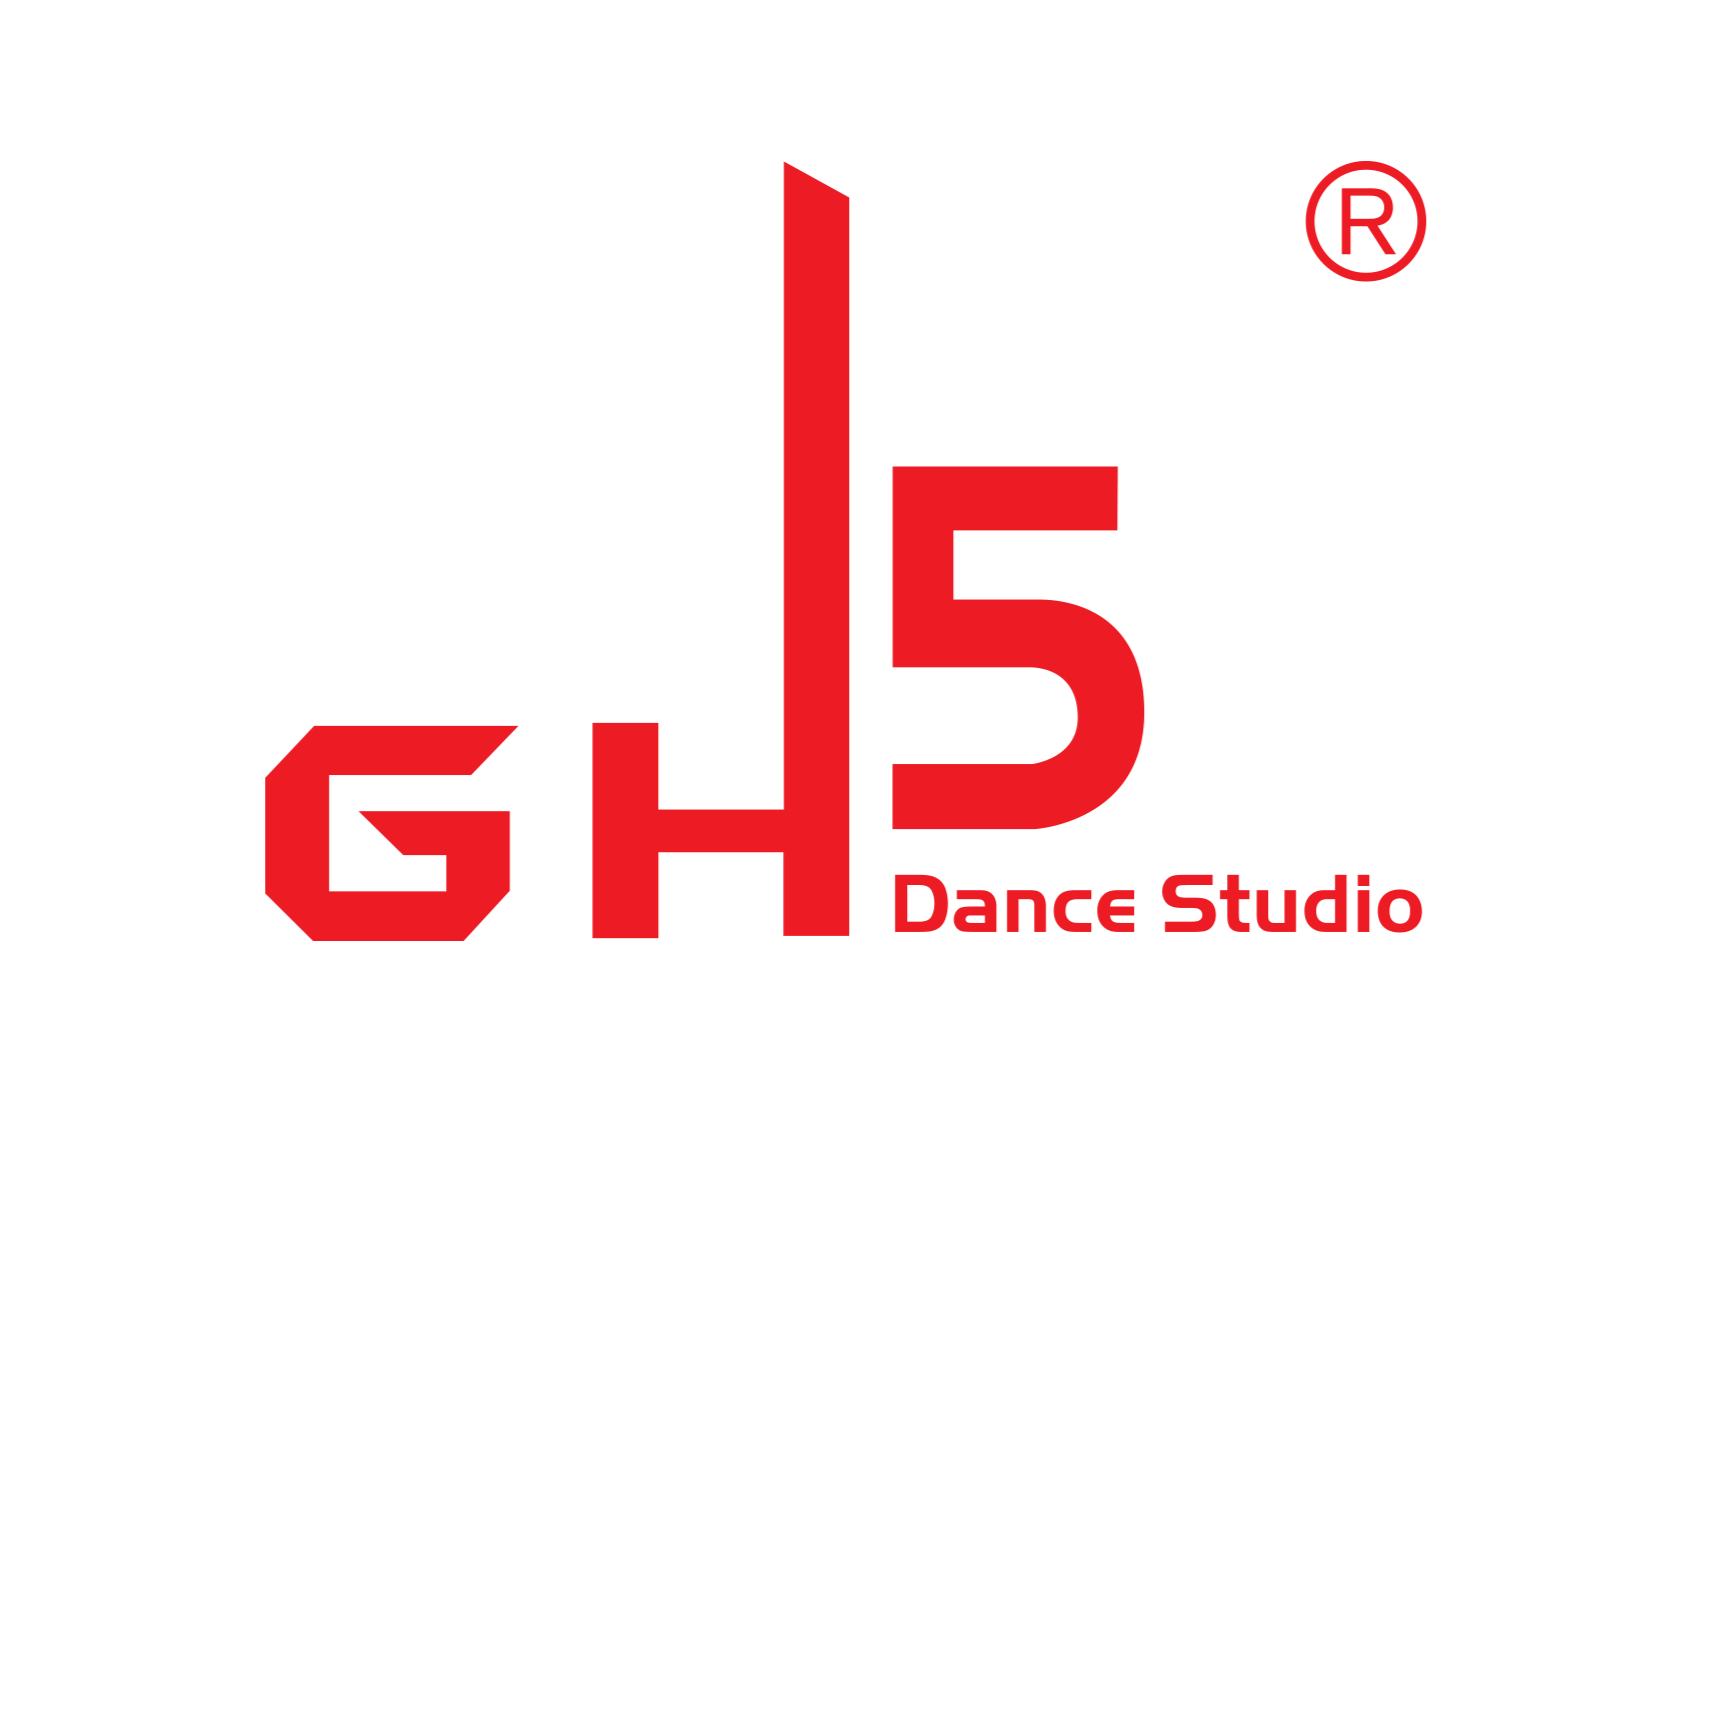 GH5舞蹈工作室